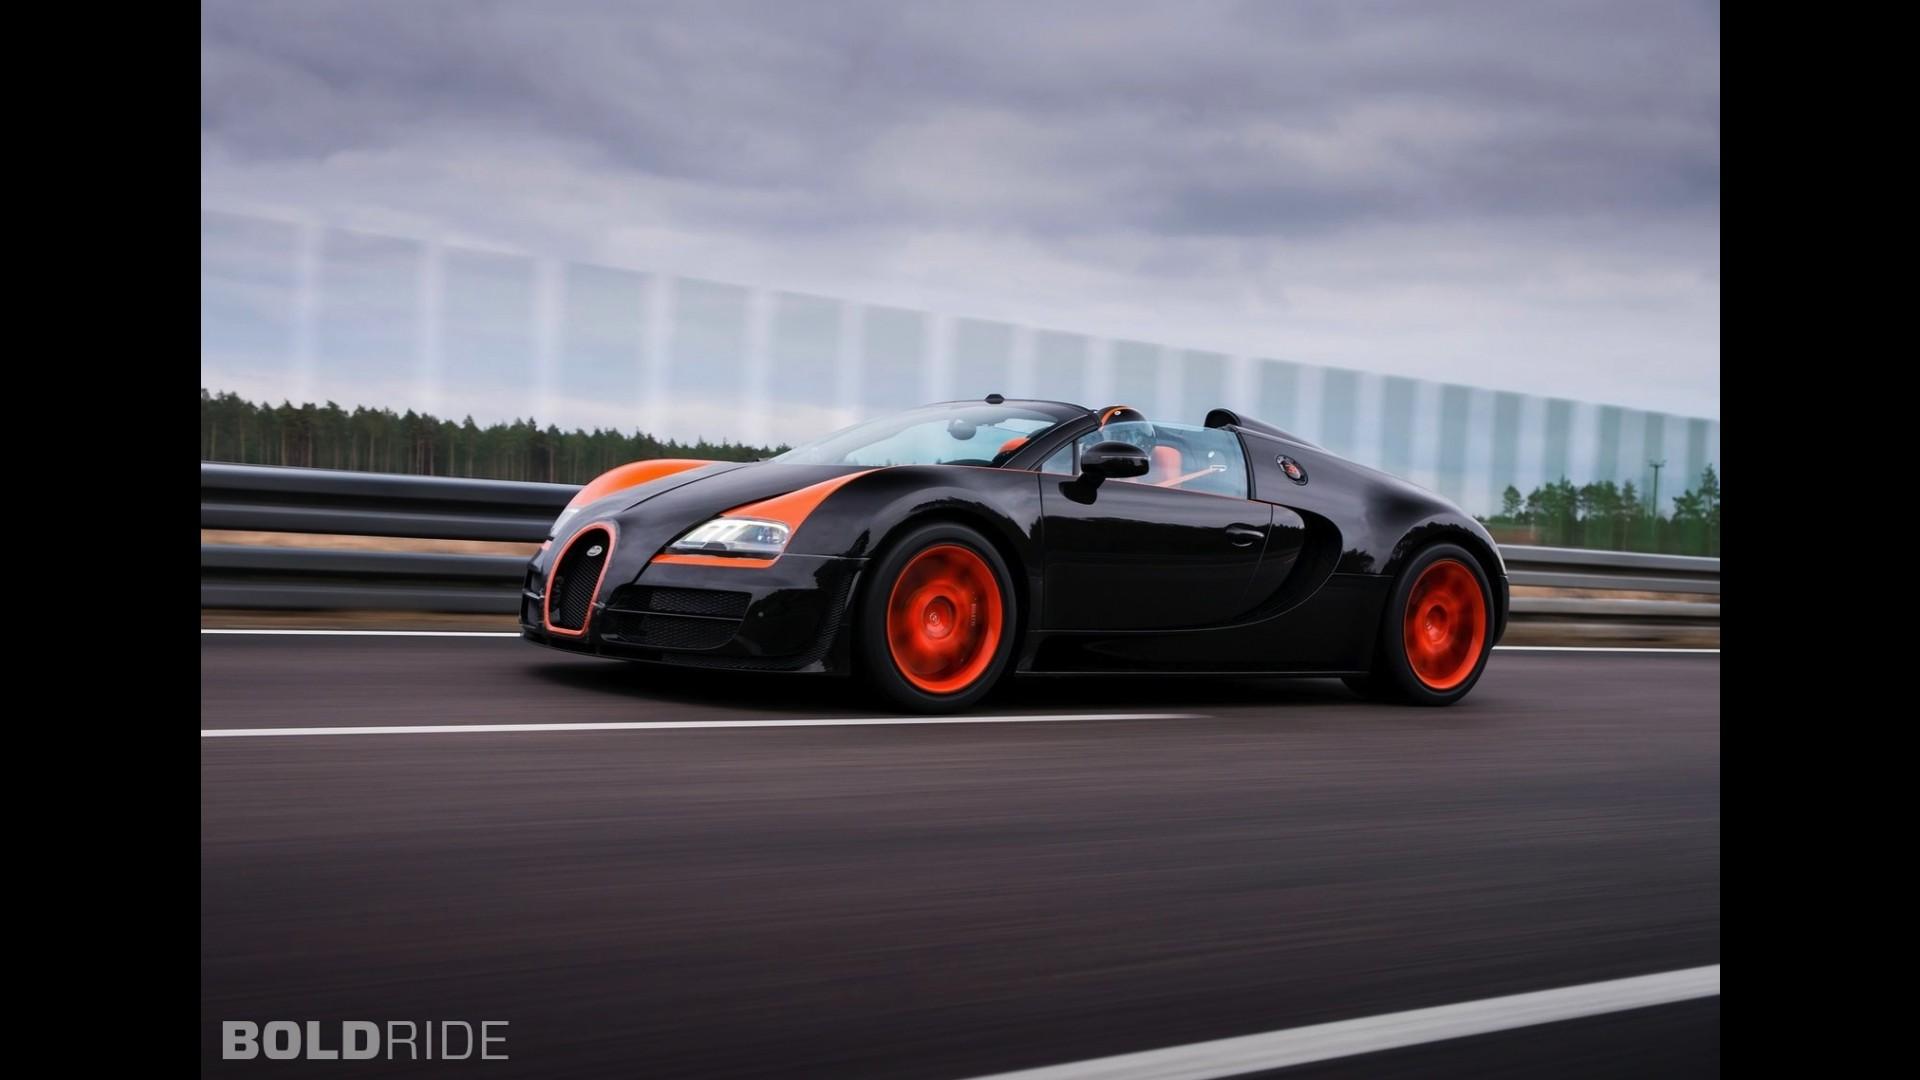 bugatti-veyron-16-4-grand-sport-vitesse-world-record-car Inspiring Bugatti Veyron Grand Sport Vitesse Wrc Cars Trend